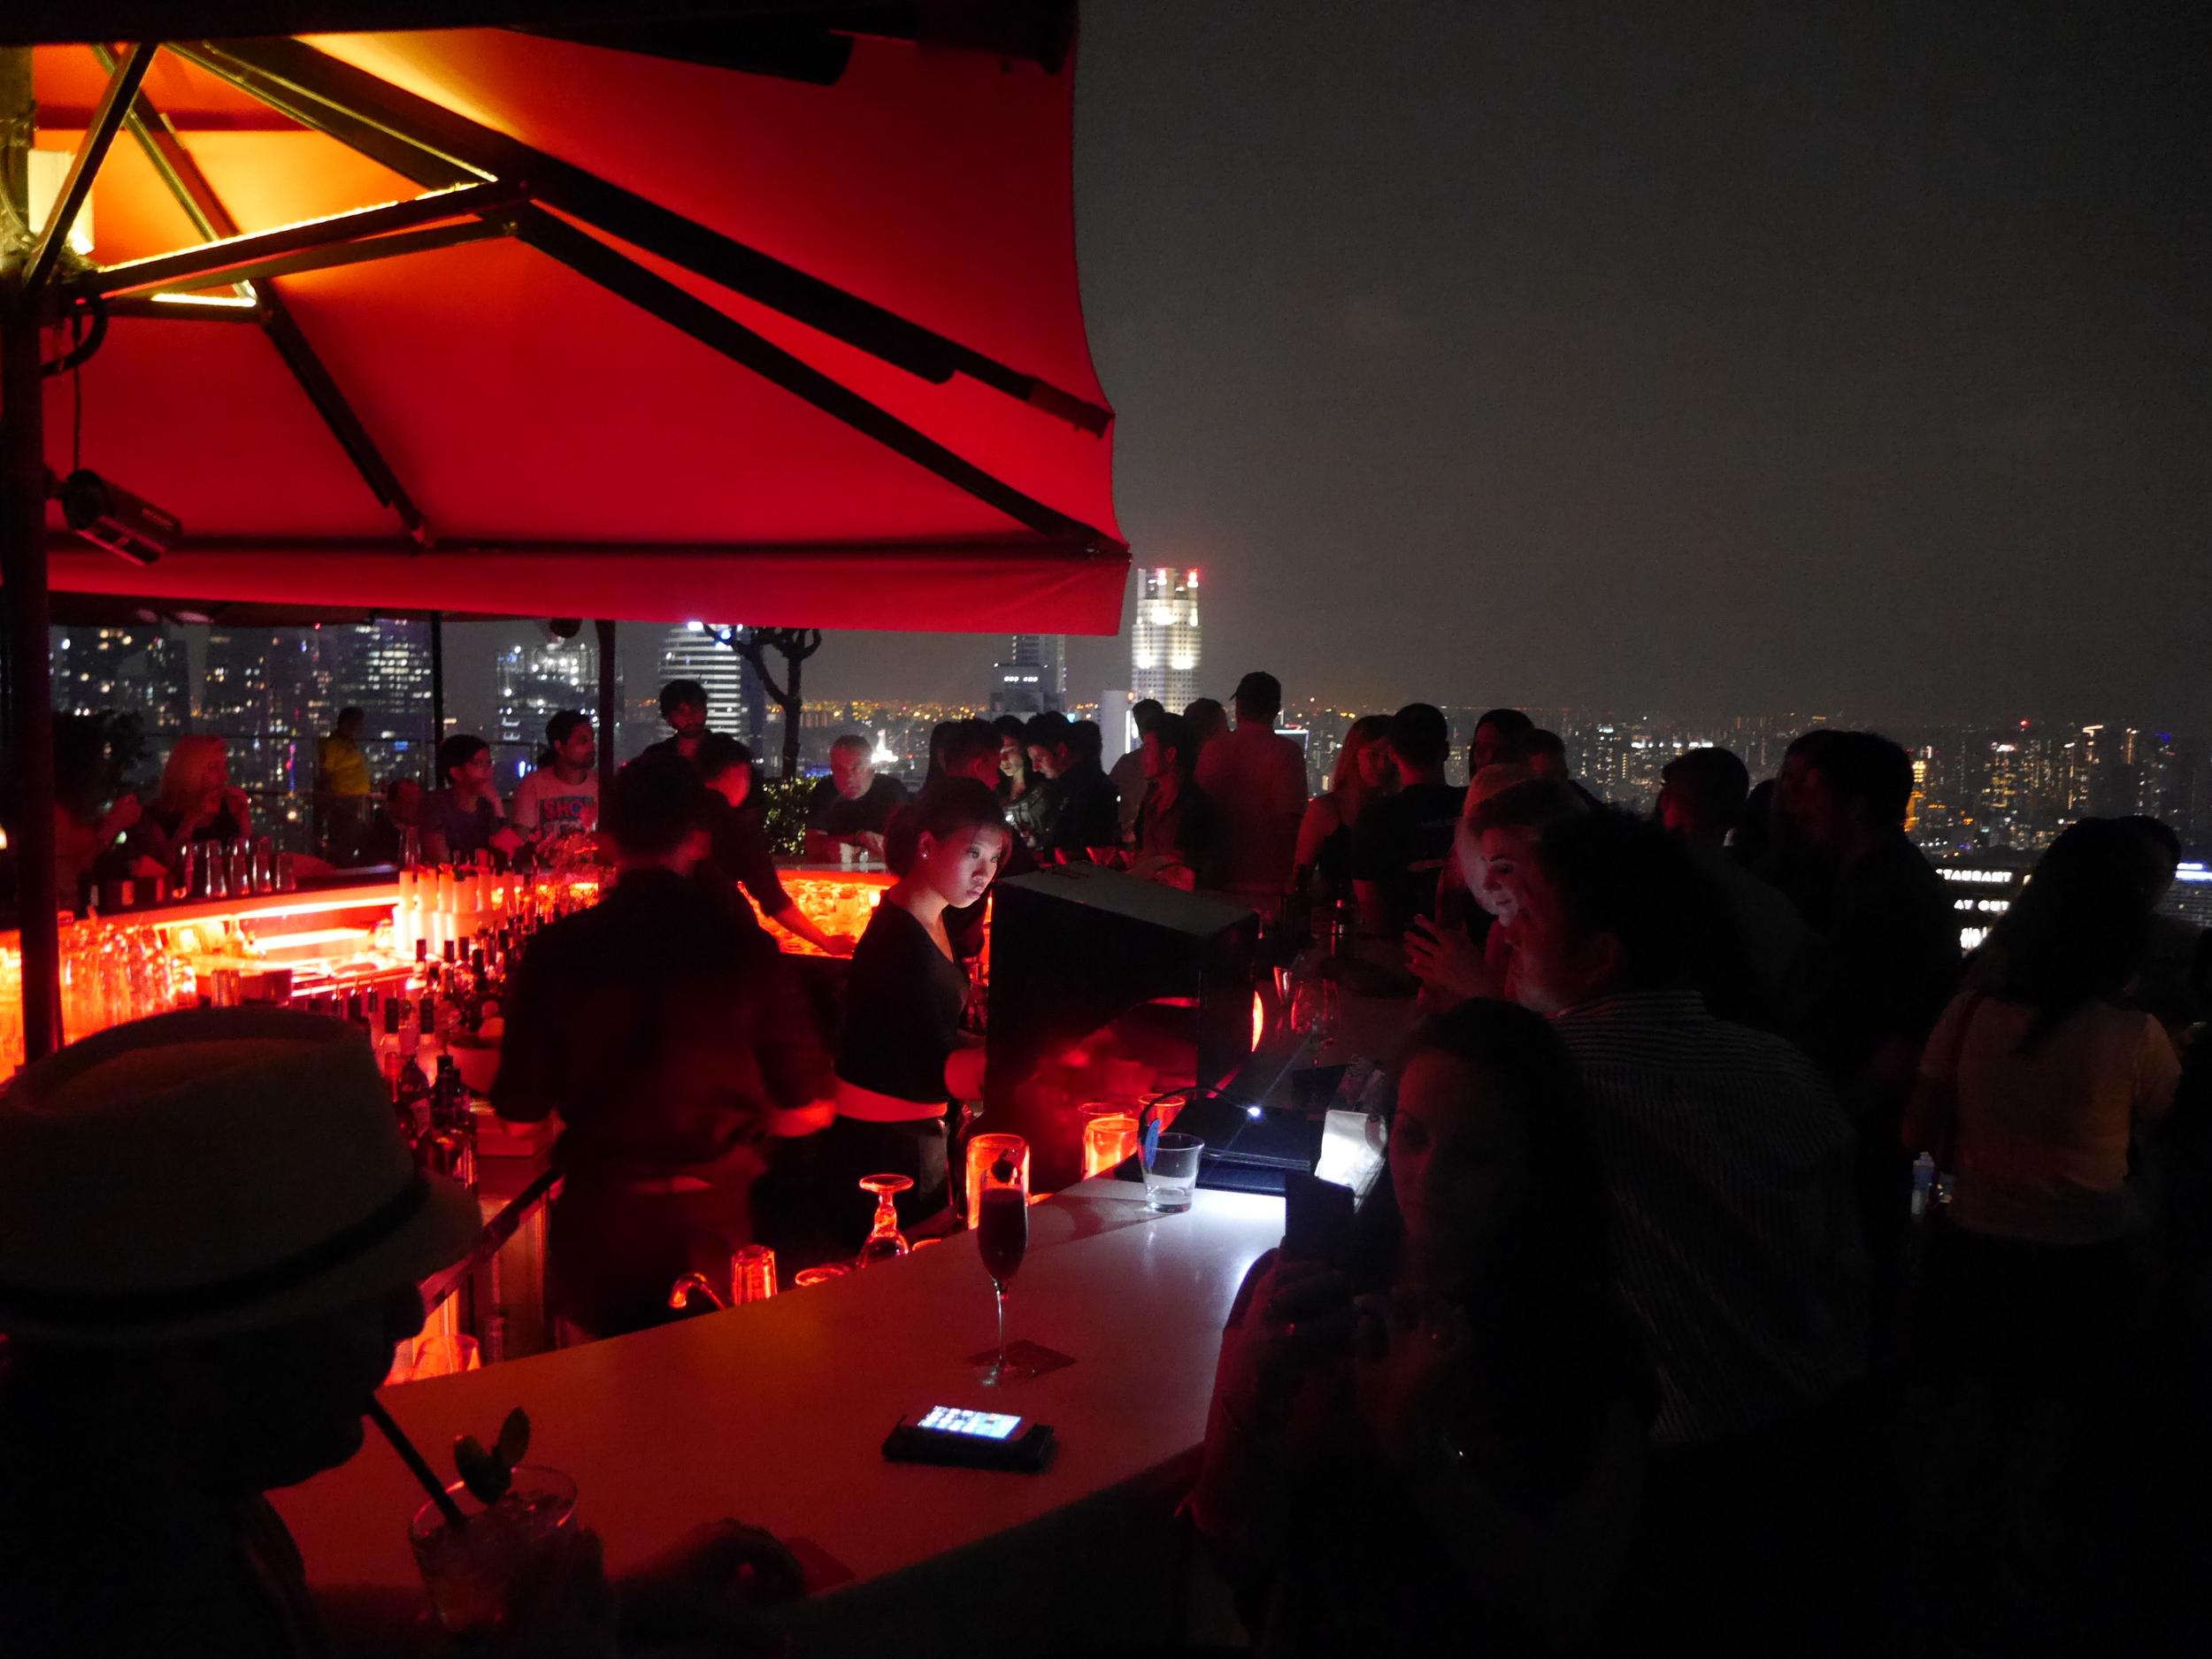 The bar itself. Pretty crowded.